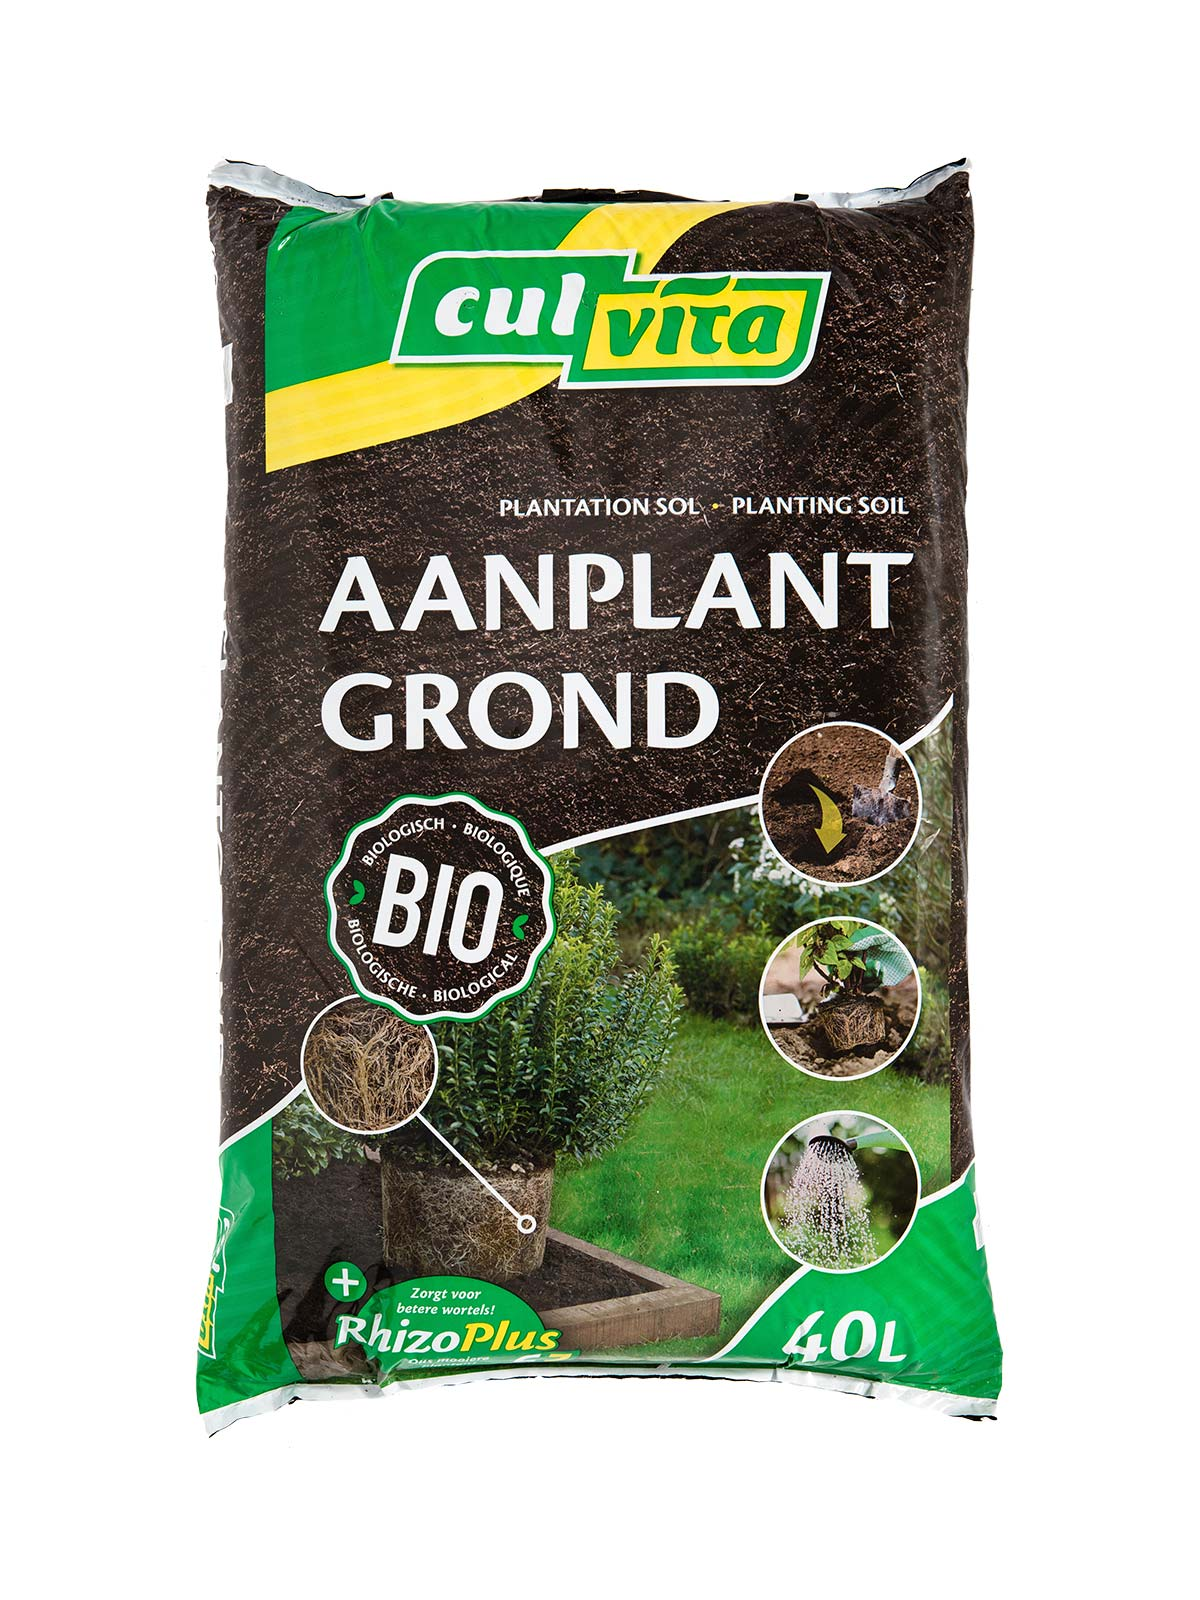 Culvita Biologische Aanplantgrond | Culvita.nl